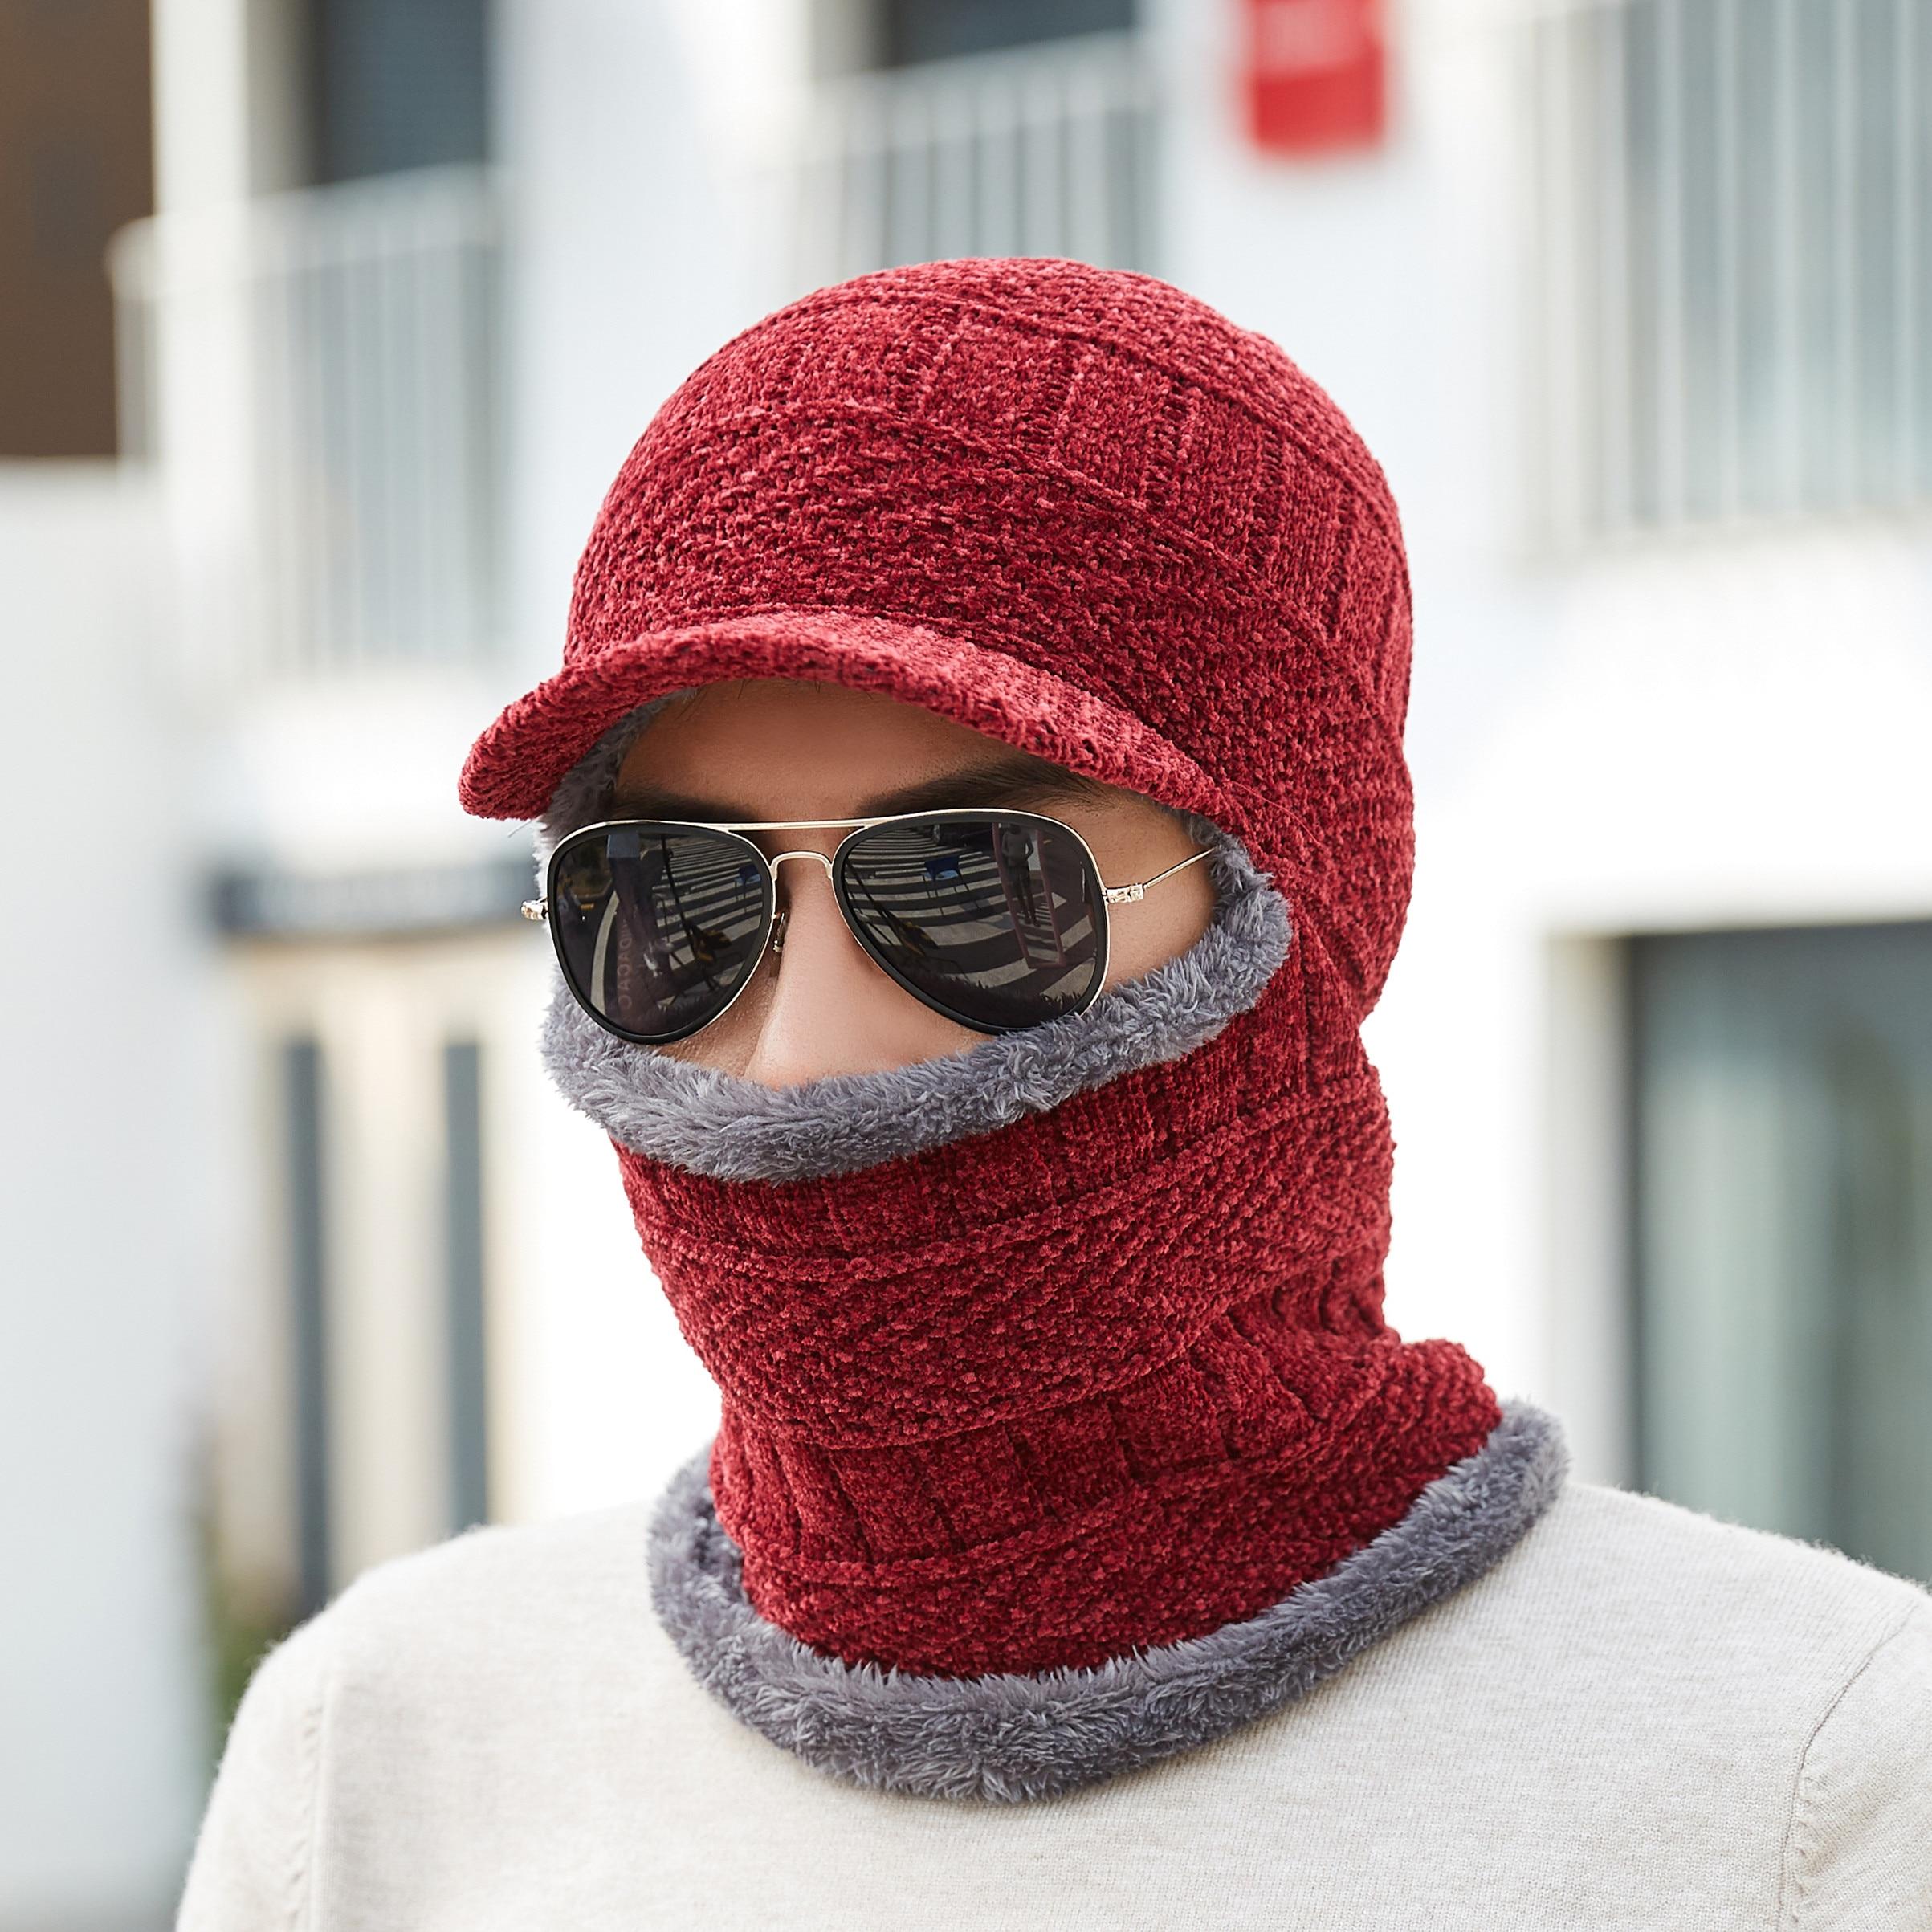 08510a5e059bb Skullies Beanies Winter Knitted Hat Men Beanie Scarf Winter Hats For ...